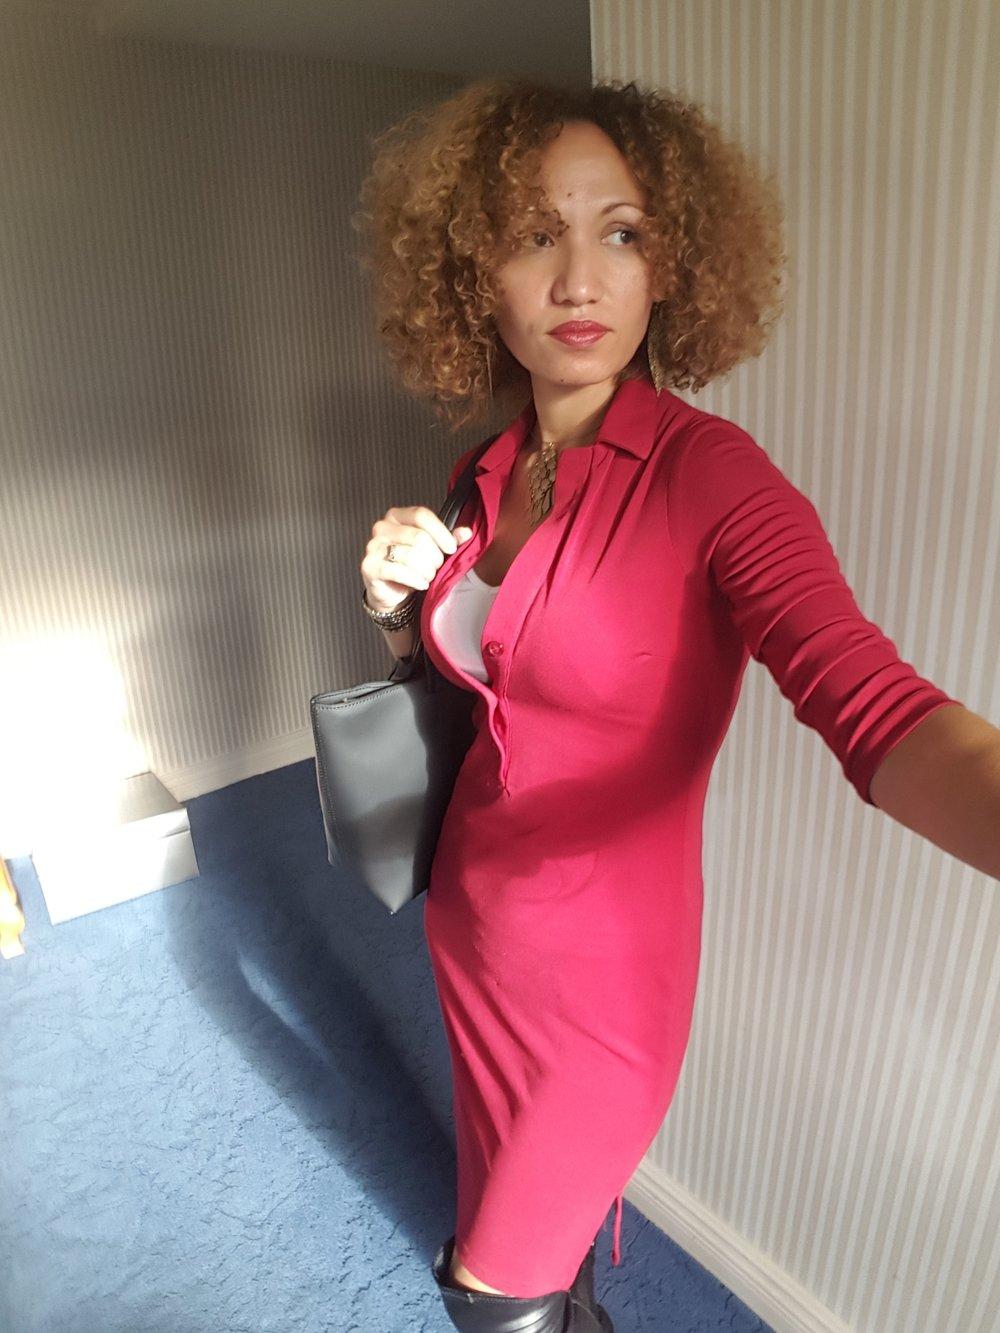 Sili_Red_Dress_Standing-e1454695918721.jpg